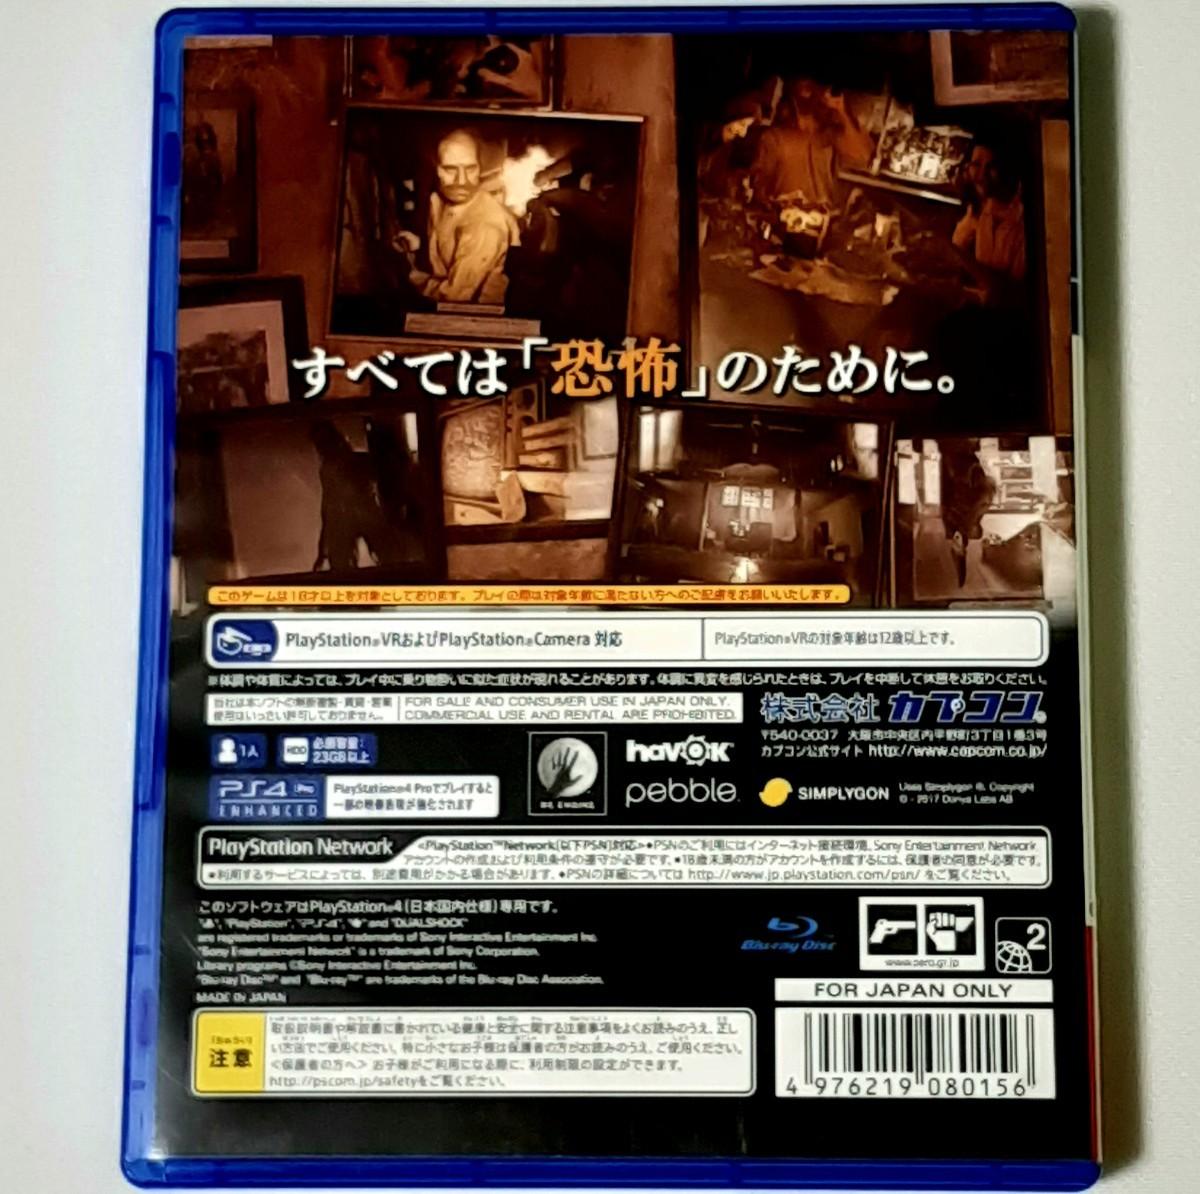 【PS4】 バイオハザード7 レジデント イービル グロテスクVer. BIOHAZARD resident evil  バイオ7